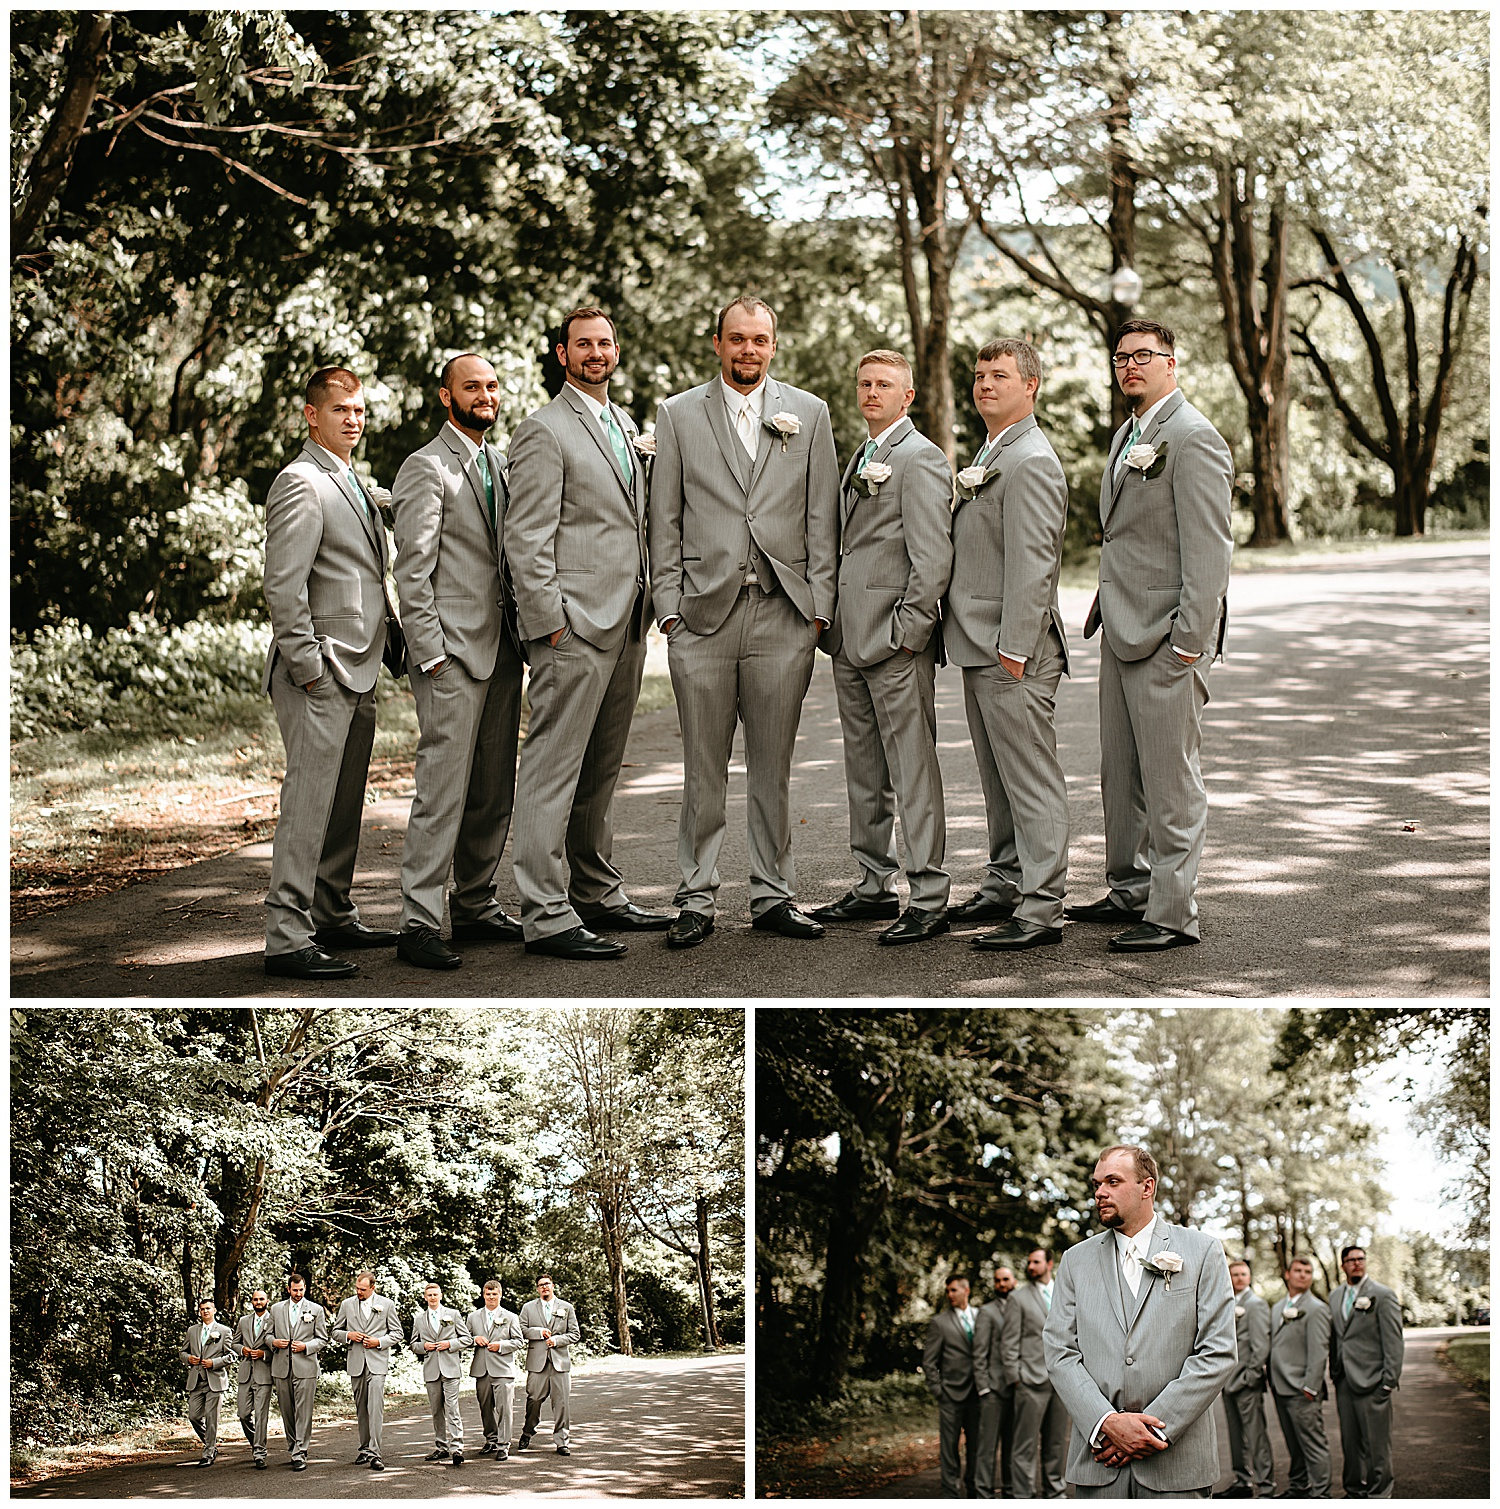 NEPA-Lehigh-Valley-Wedding-Photographer-at-Fountain-Springs-Country-Inn-Ashland-PA_0037.jpg